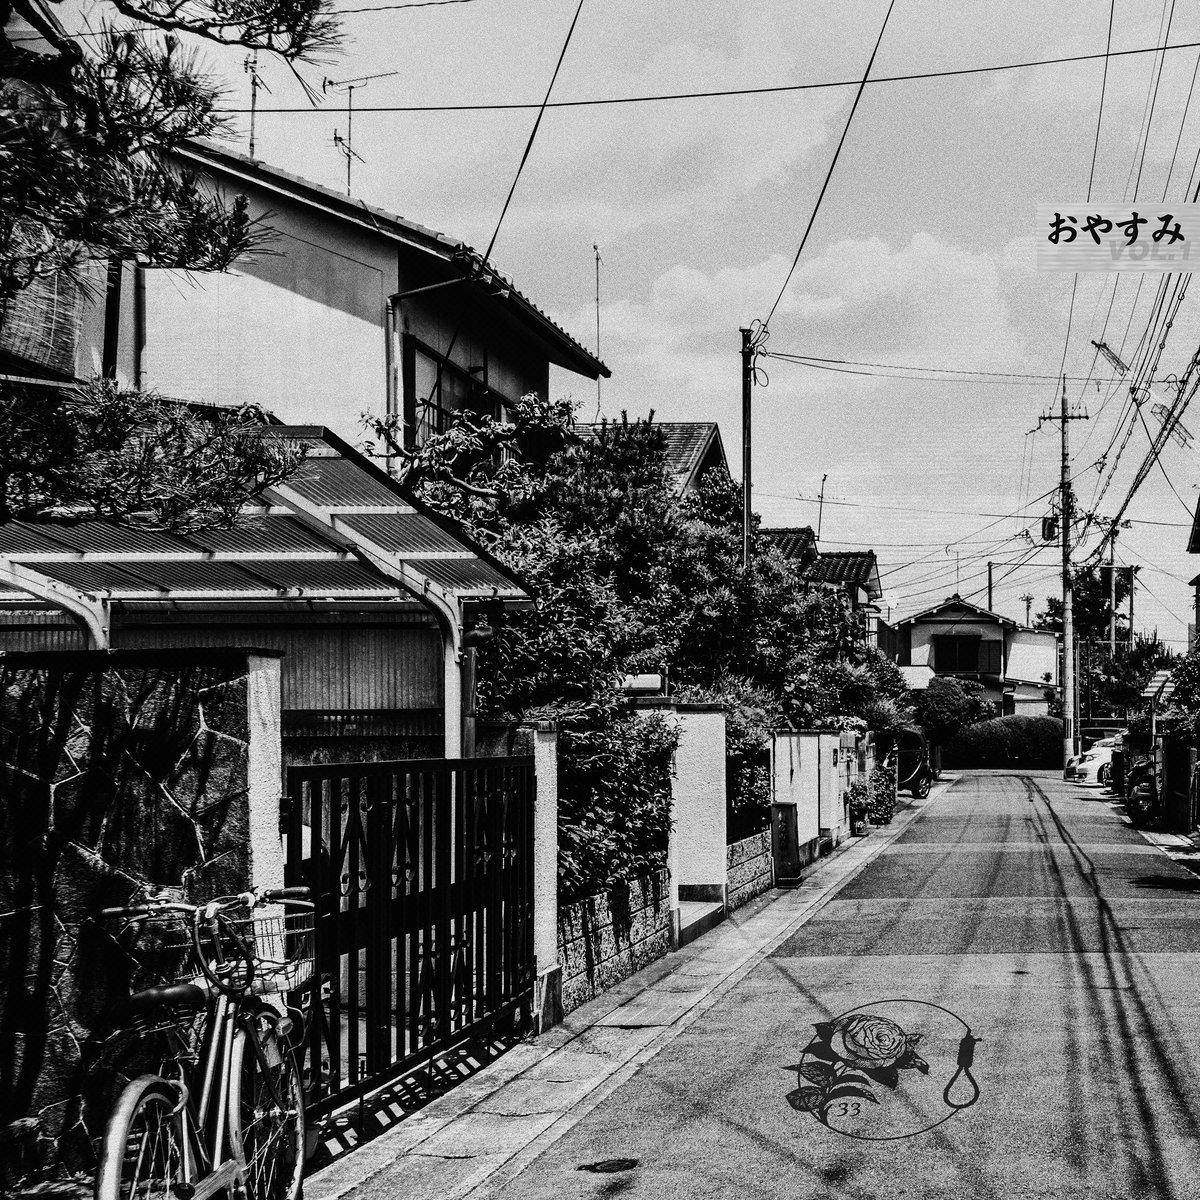 Hikikomori | Desolate